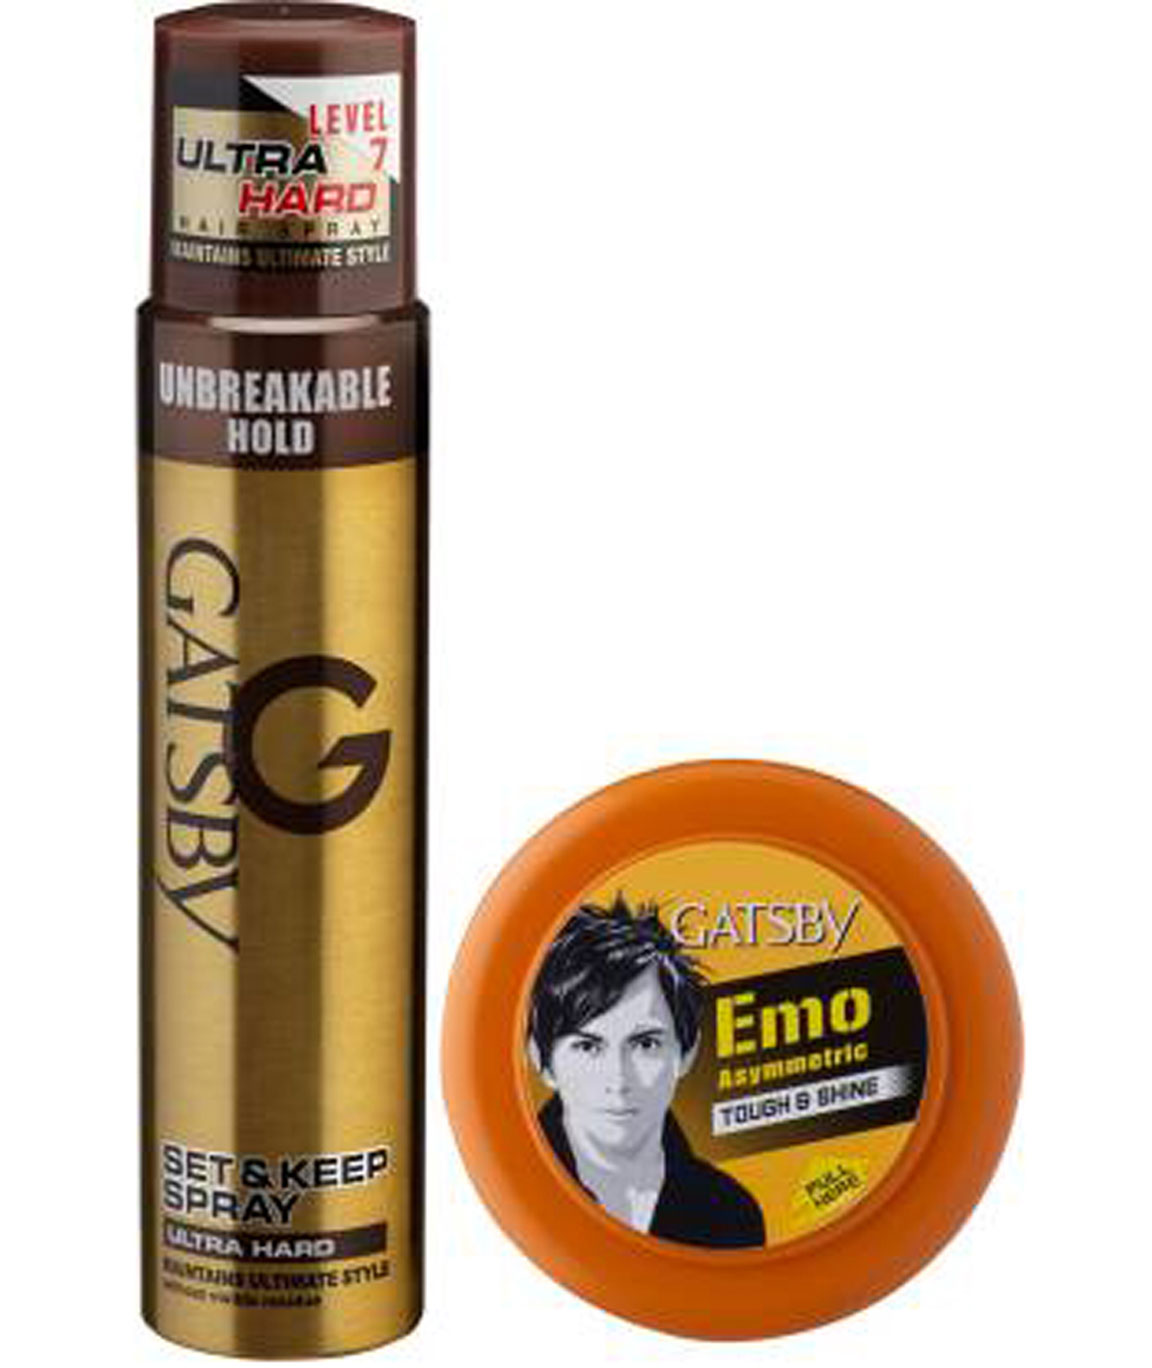 SHARE GATSBY SET & KEEP HAIR SPRAY ULTRA HARD 250 ML WITH HAIR STYLING WAX TOUGH & SHINE 75 Gm SPRAY (325 G)